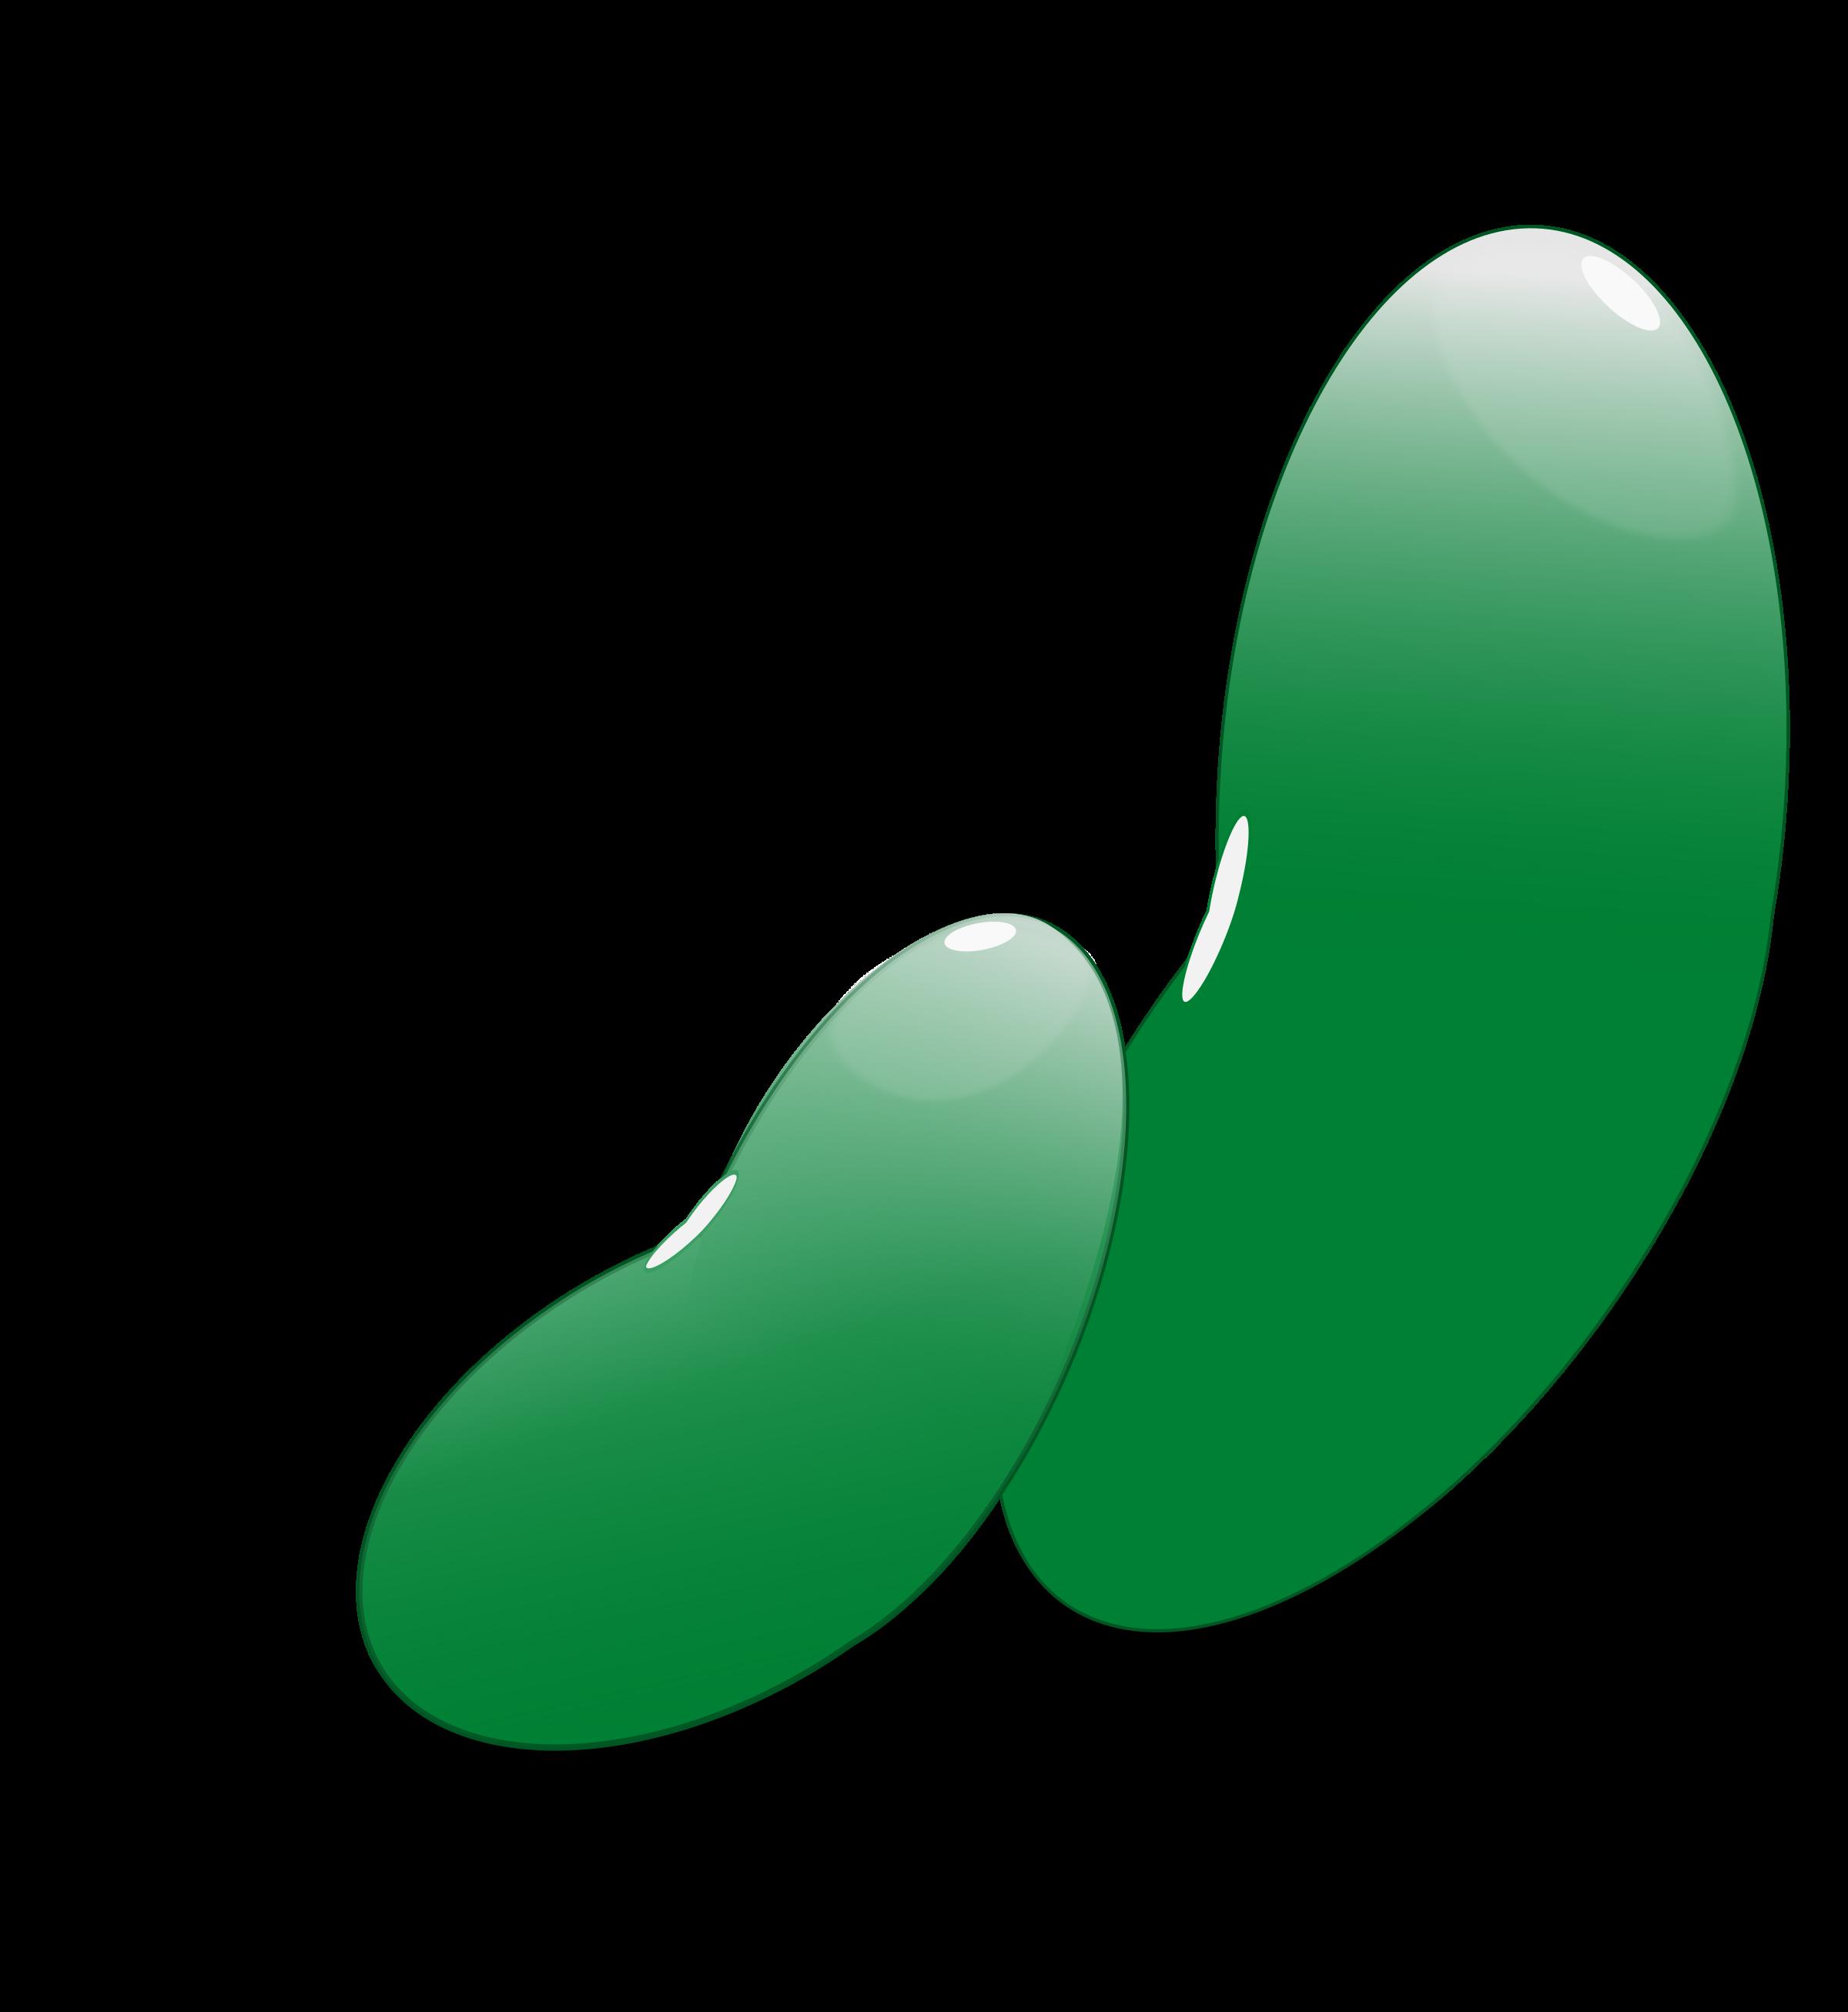 Bean clipart green bean. Beans big image png